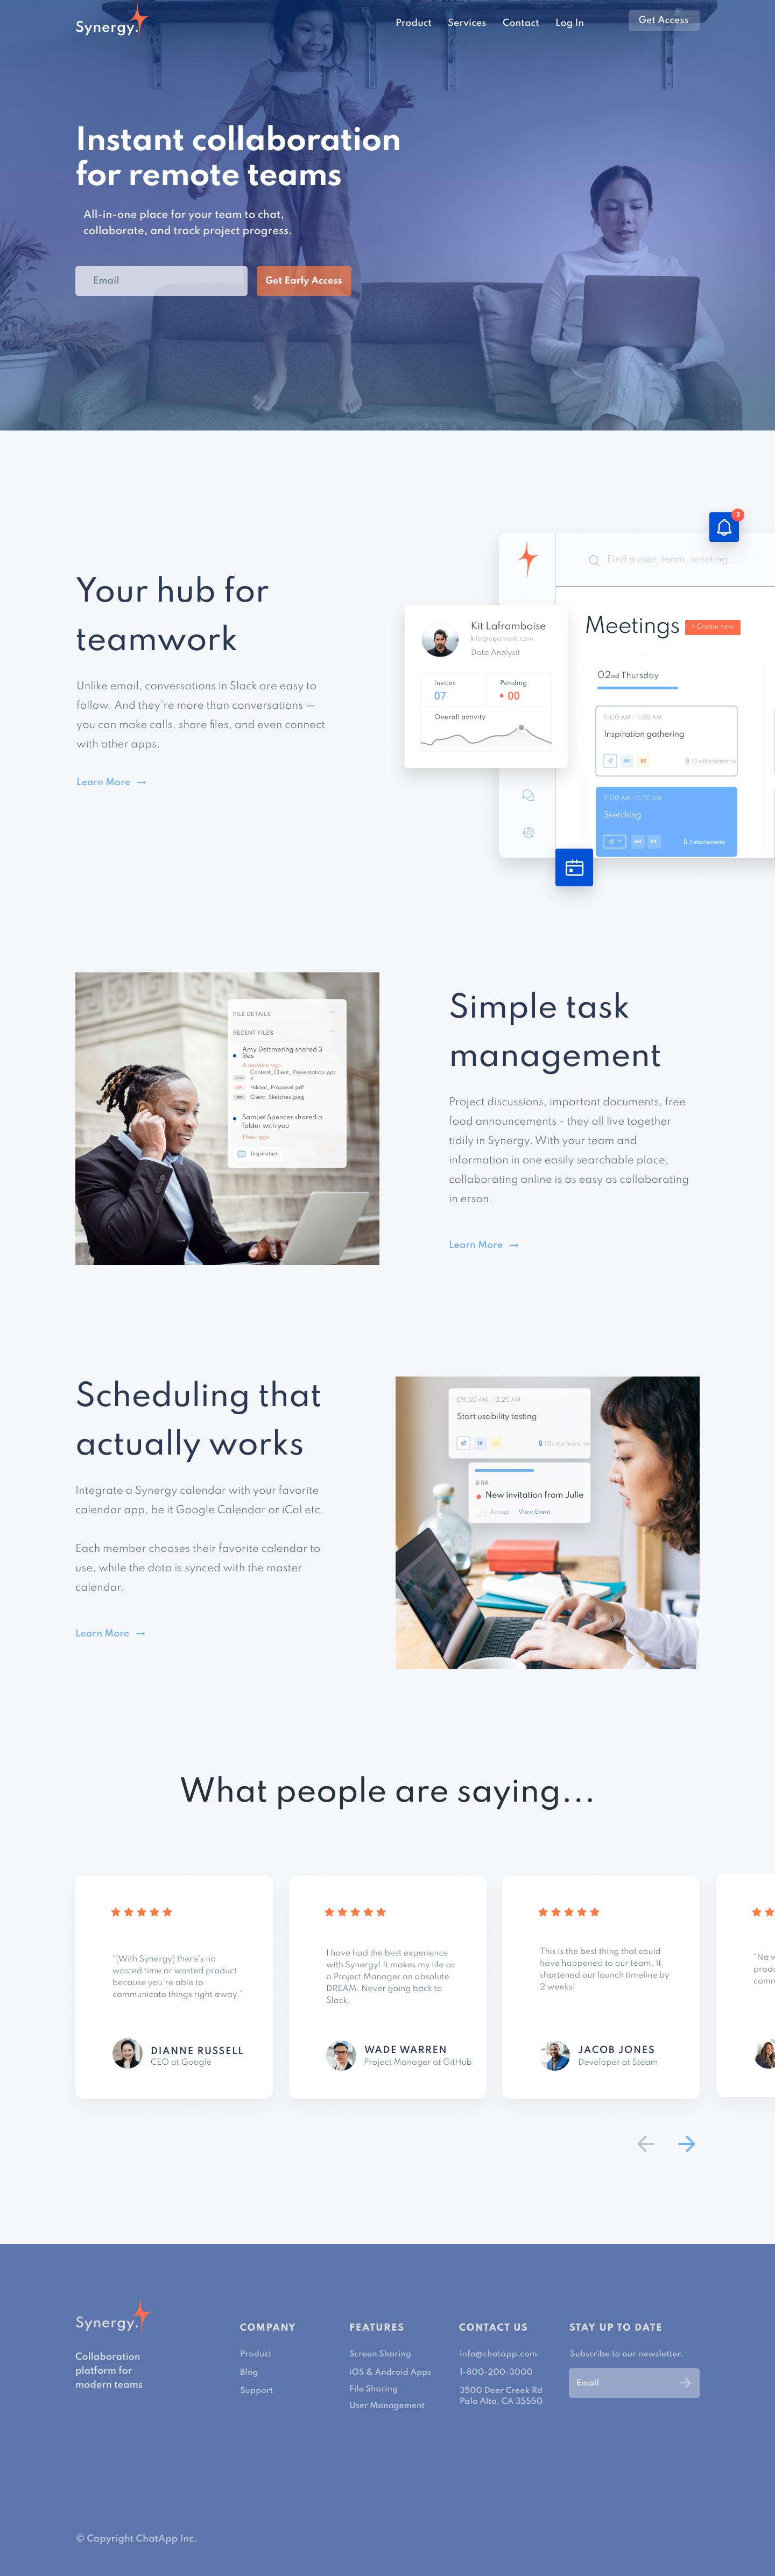 Website design & brand strategy